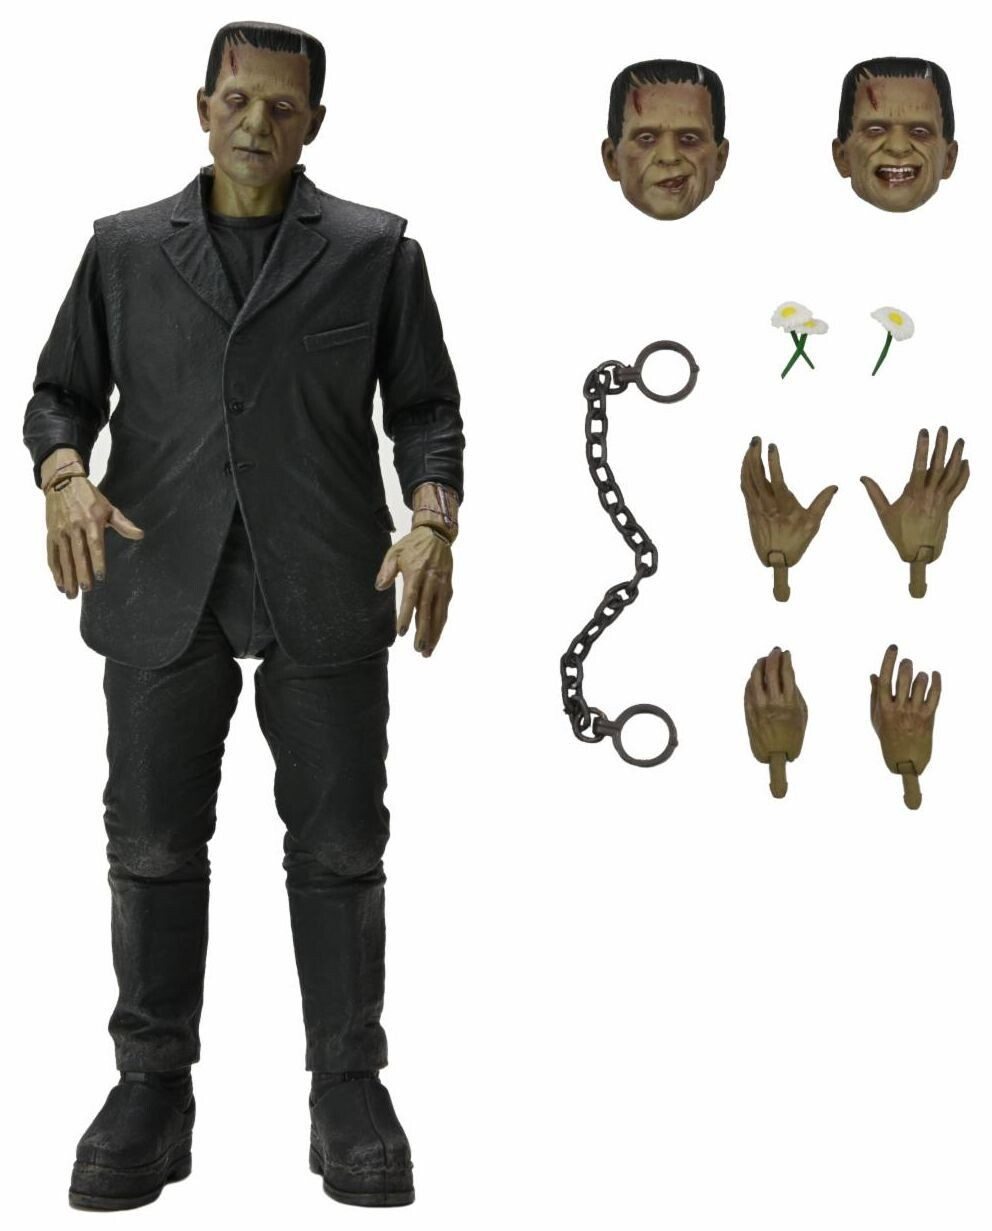 "PRE-ORDER Neca Universal Monsters - 7"" Scale Action Figure - Ultimate Frankenstein's Monster (COLOR)"